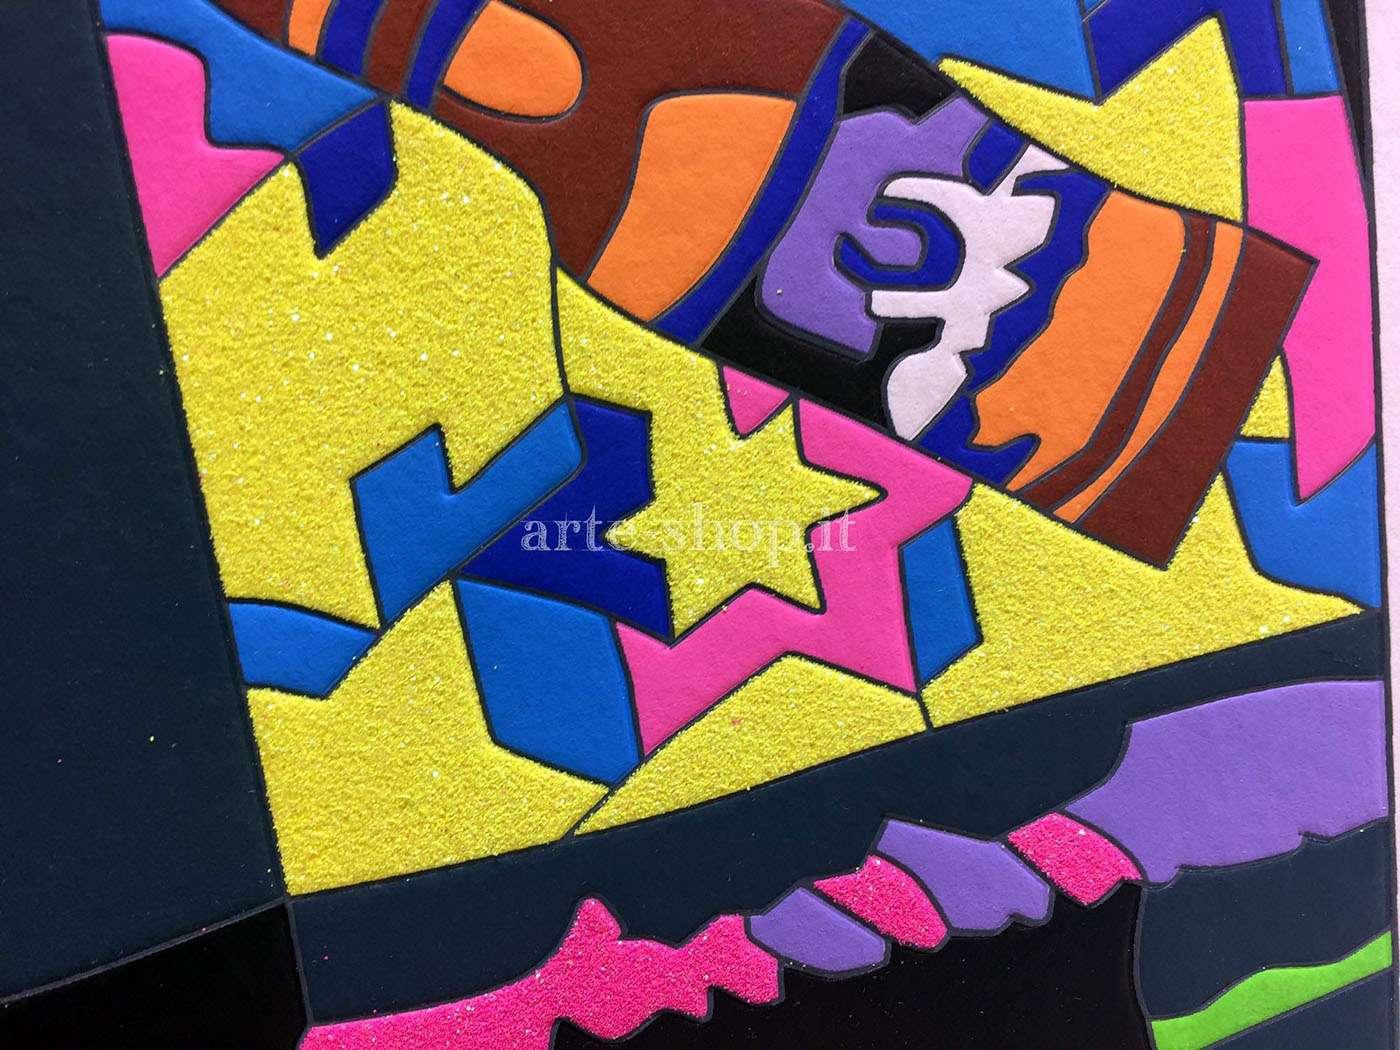 arte pentagono shop dettaglio numero 231